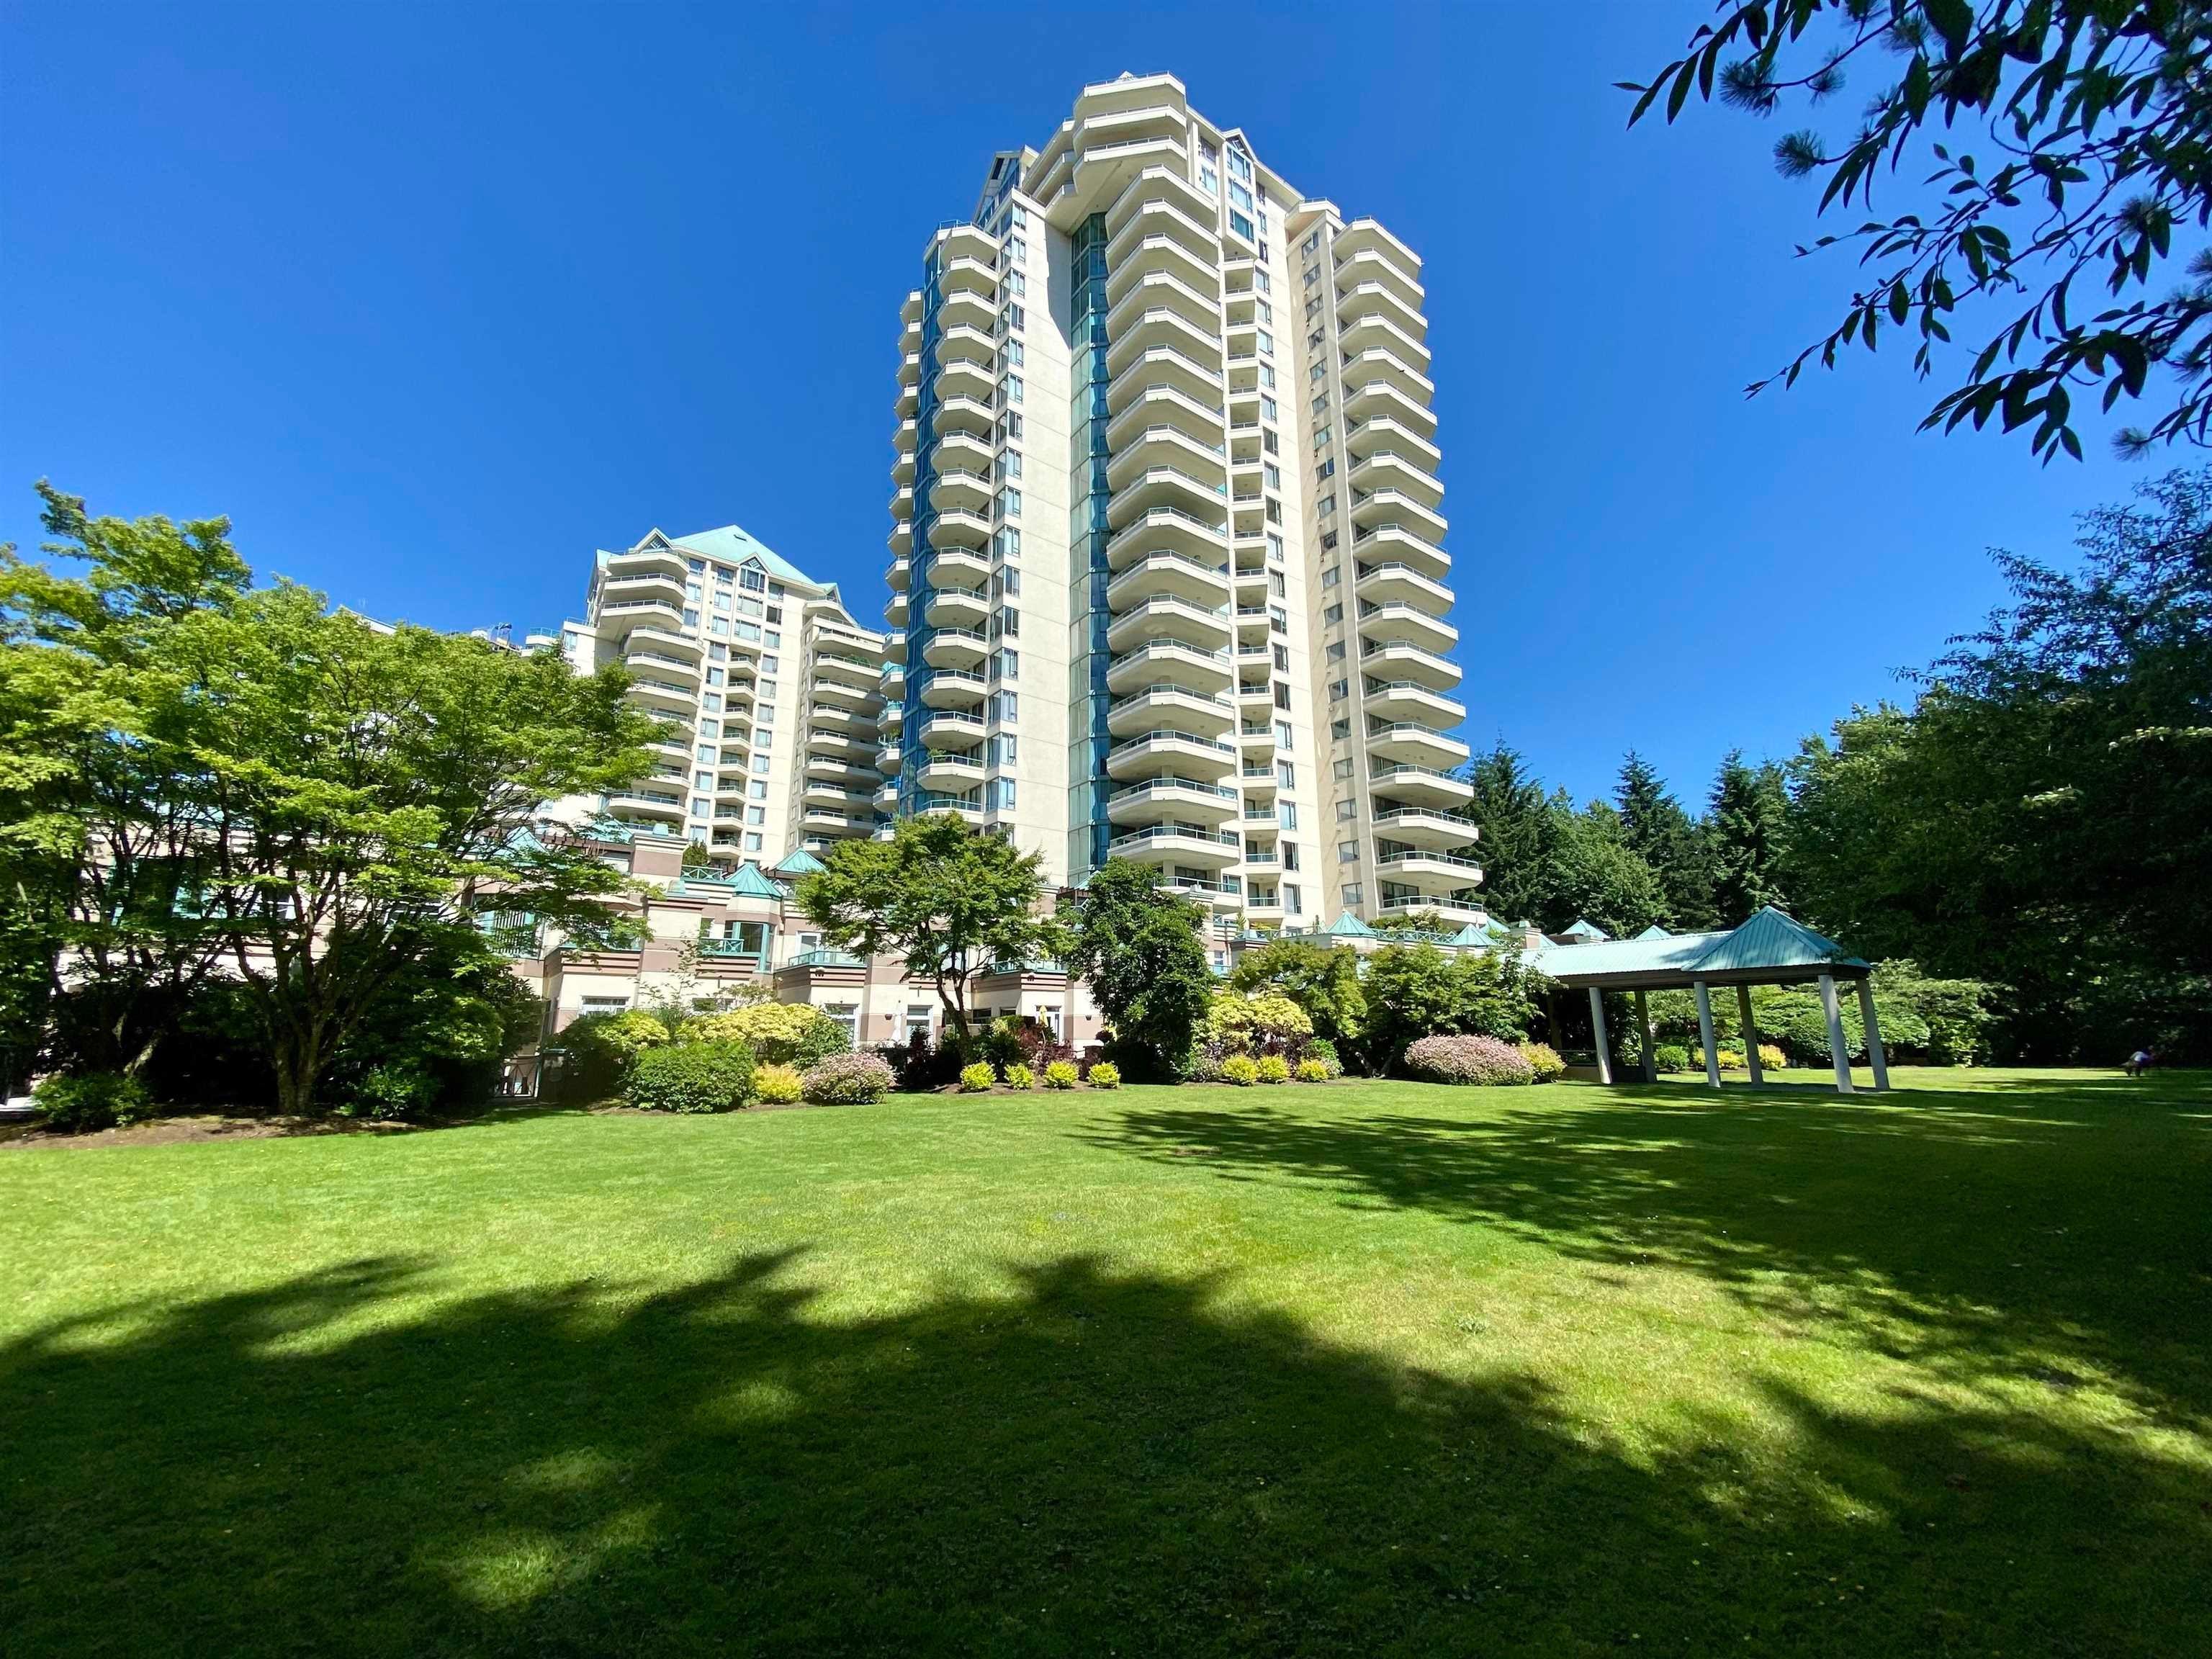 19B 338 TAYLOR WAY - Park Royal Apartment/Condo for sale, 2 Bedrooms (R2628396)